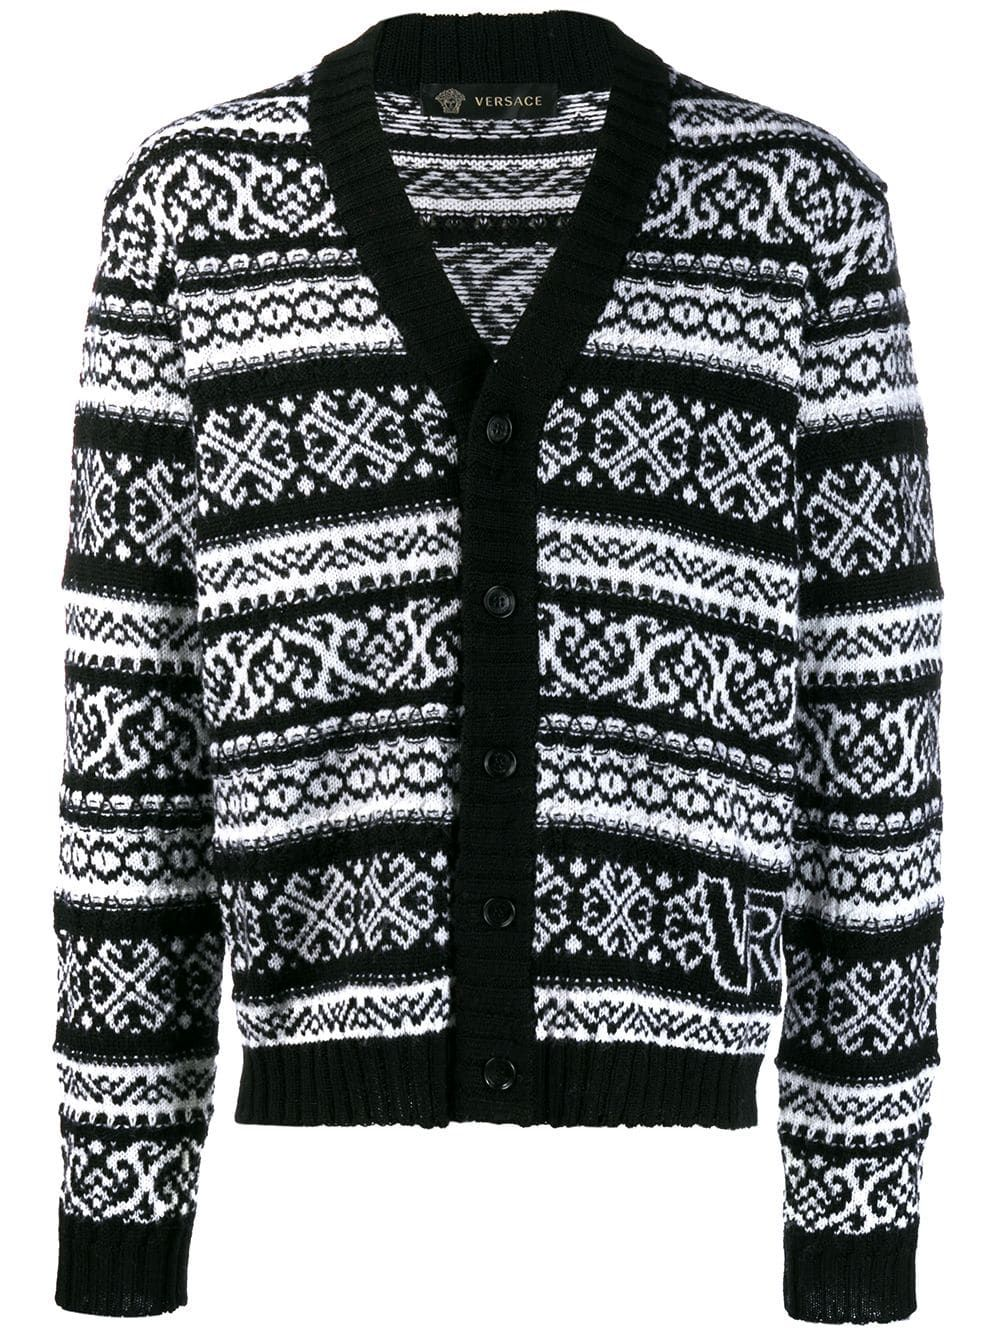 Versace Intarsia Knit Cardigan | Knit cardigan, Versace